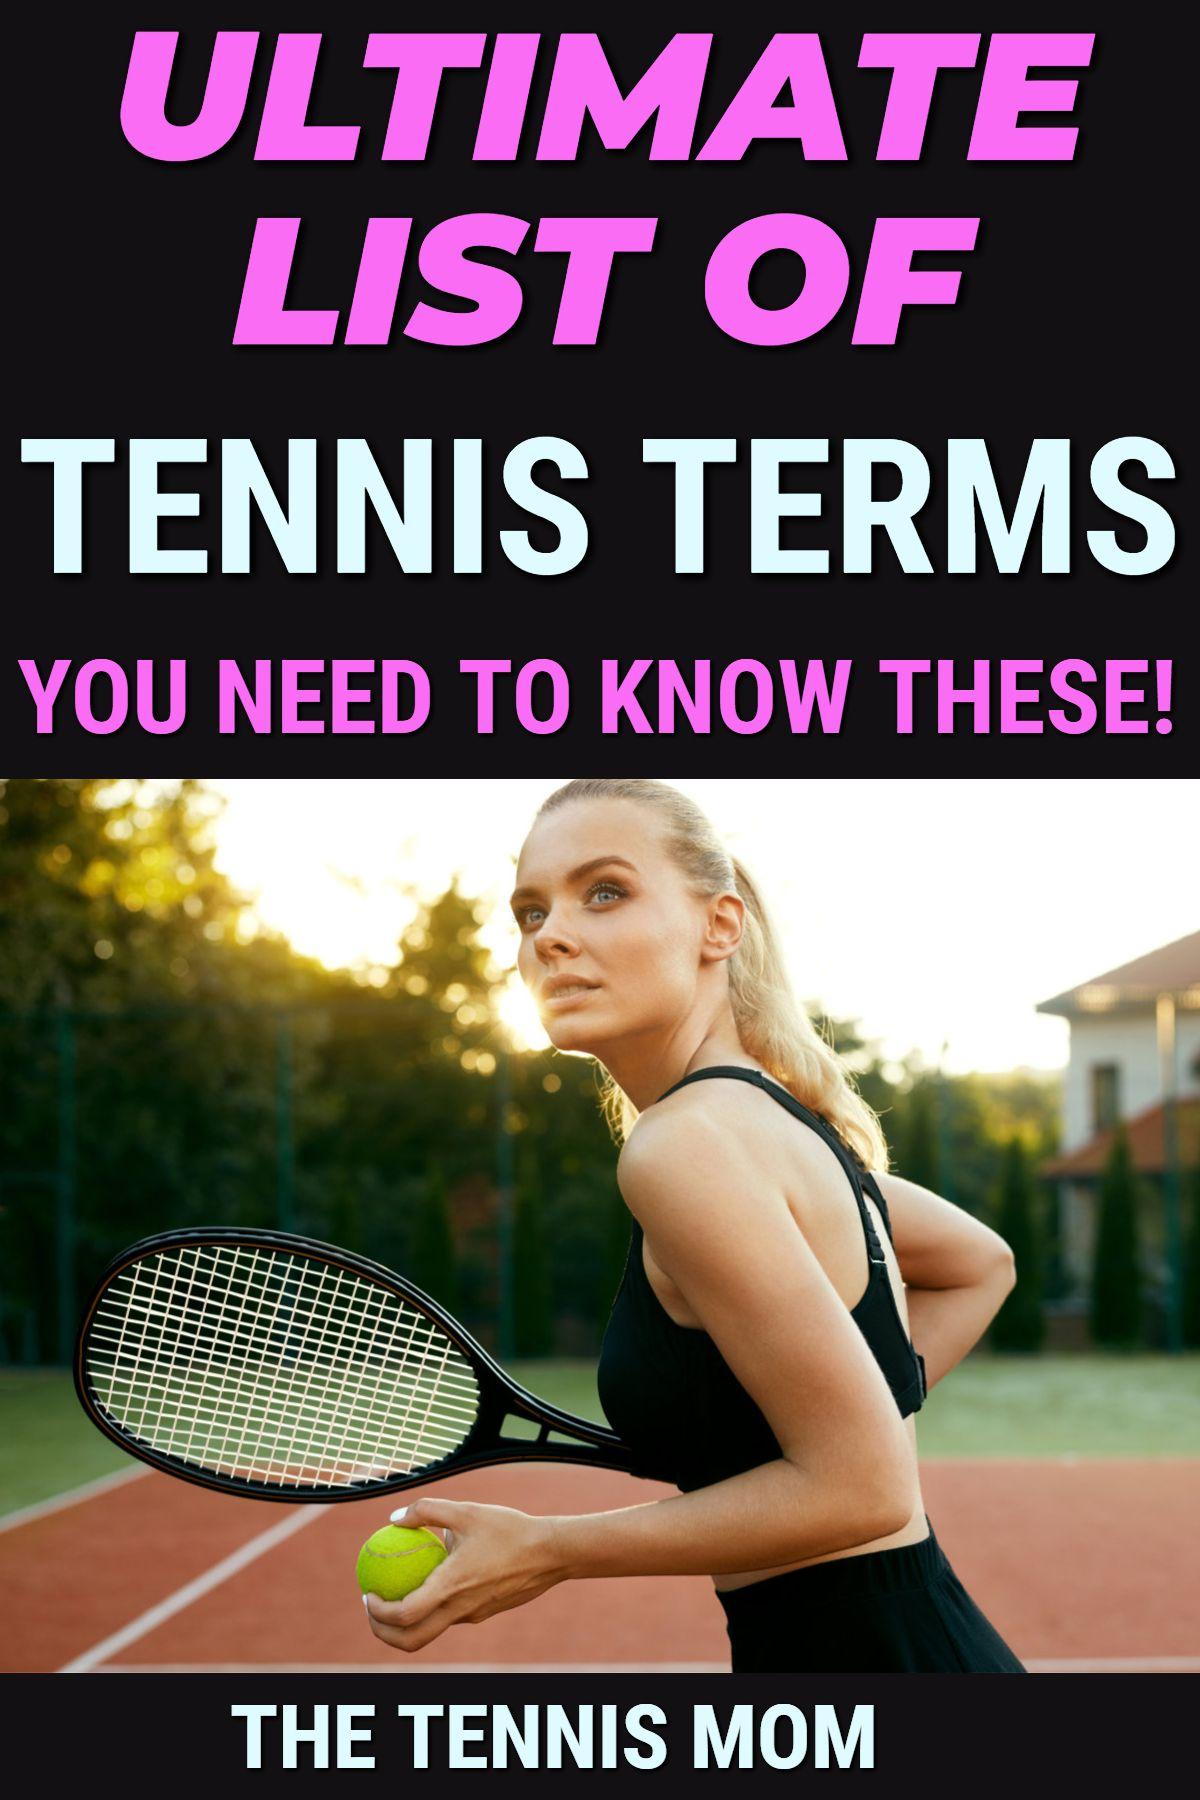 Tennis Terms List For Beginners In 2020 Tennis Terms Tennis Beginner Tennis